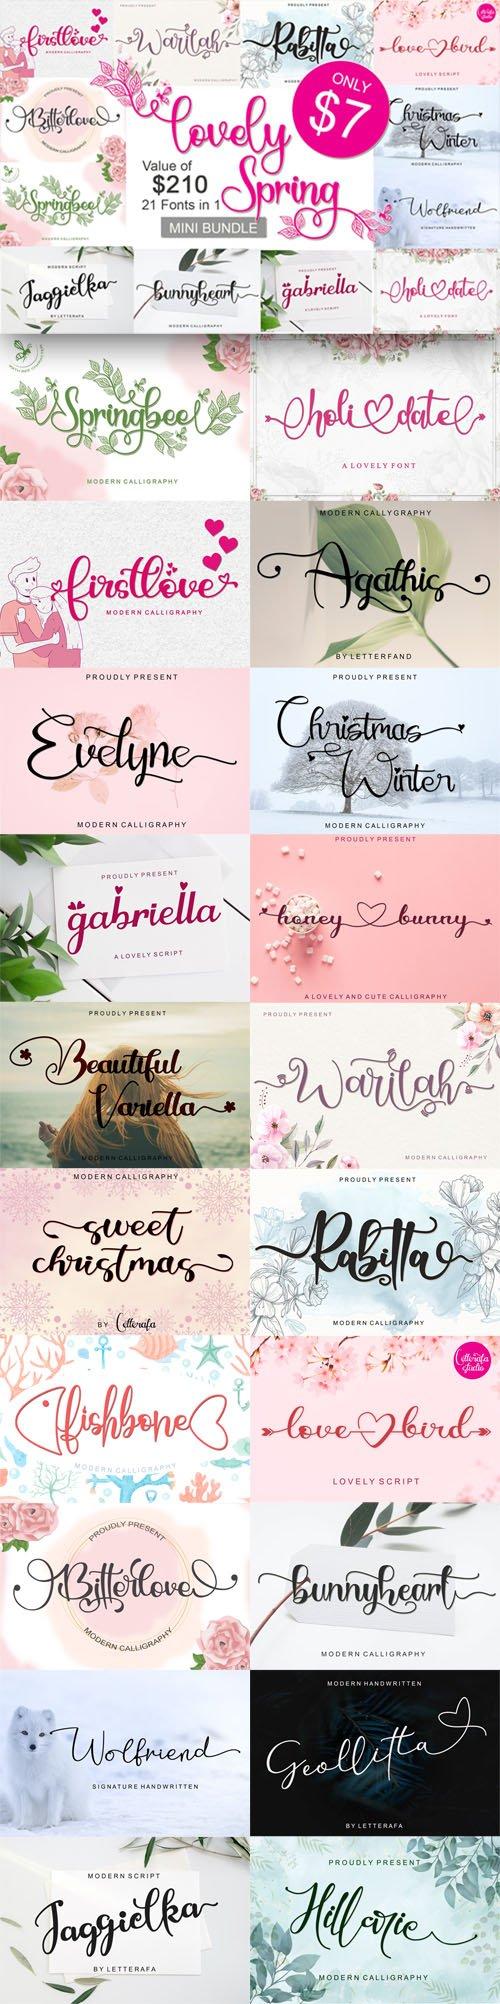 Lovely Spring Mini Bundle - 21 Fonts in 1